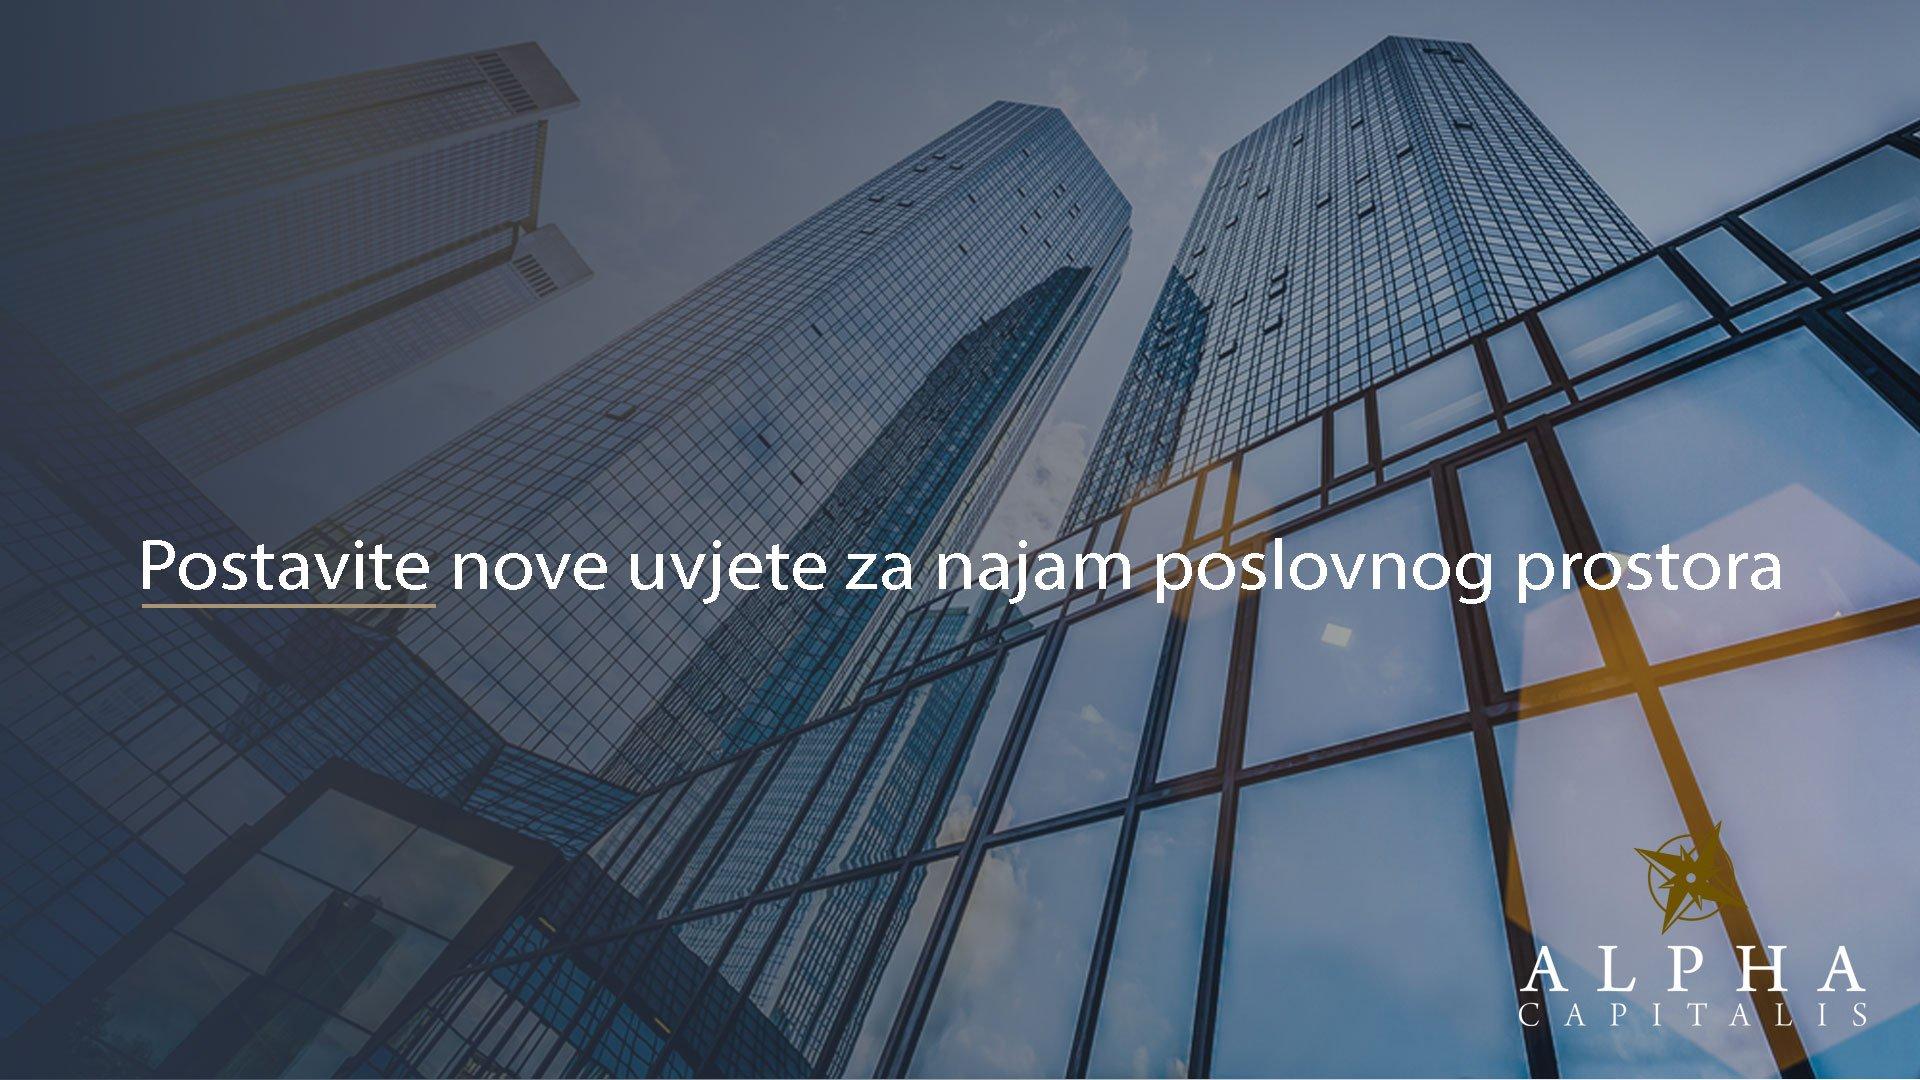 alpha-capitalis-novosti-